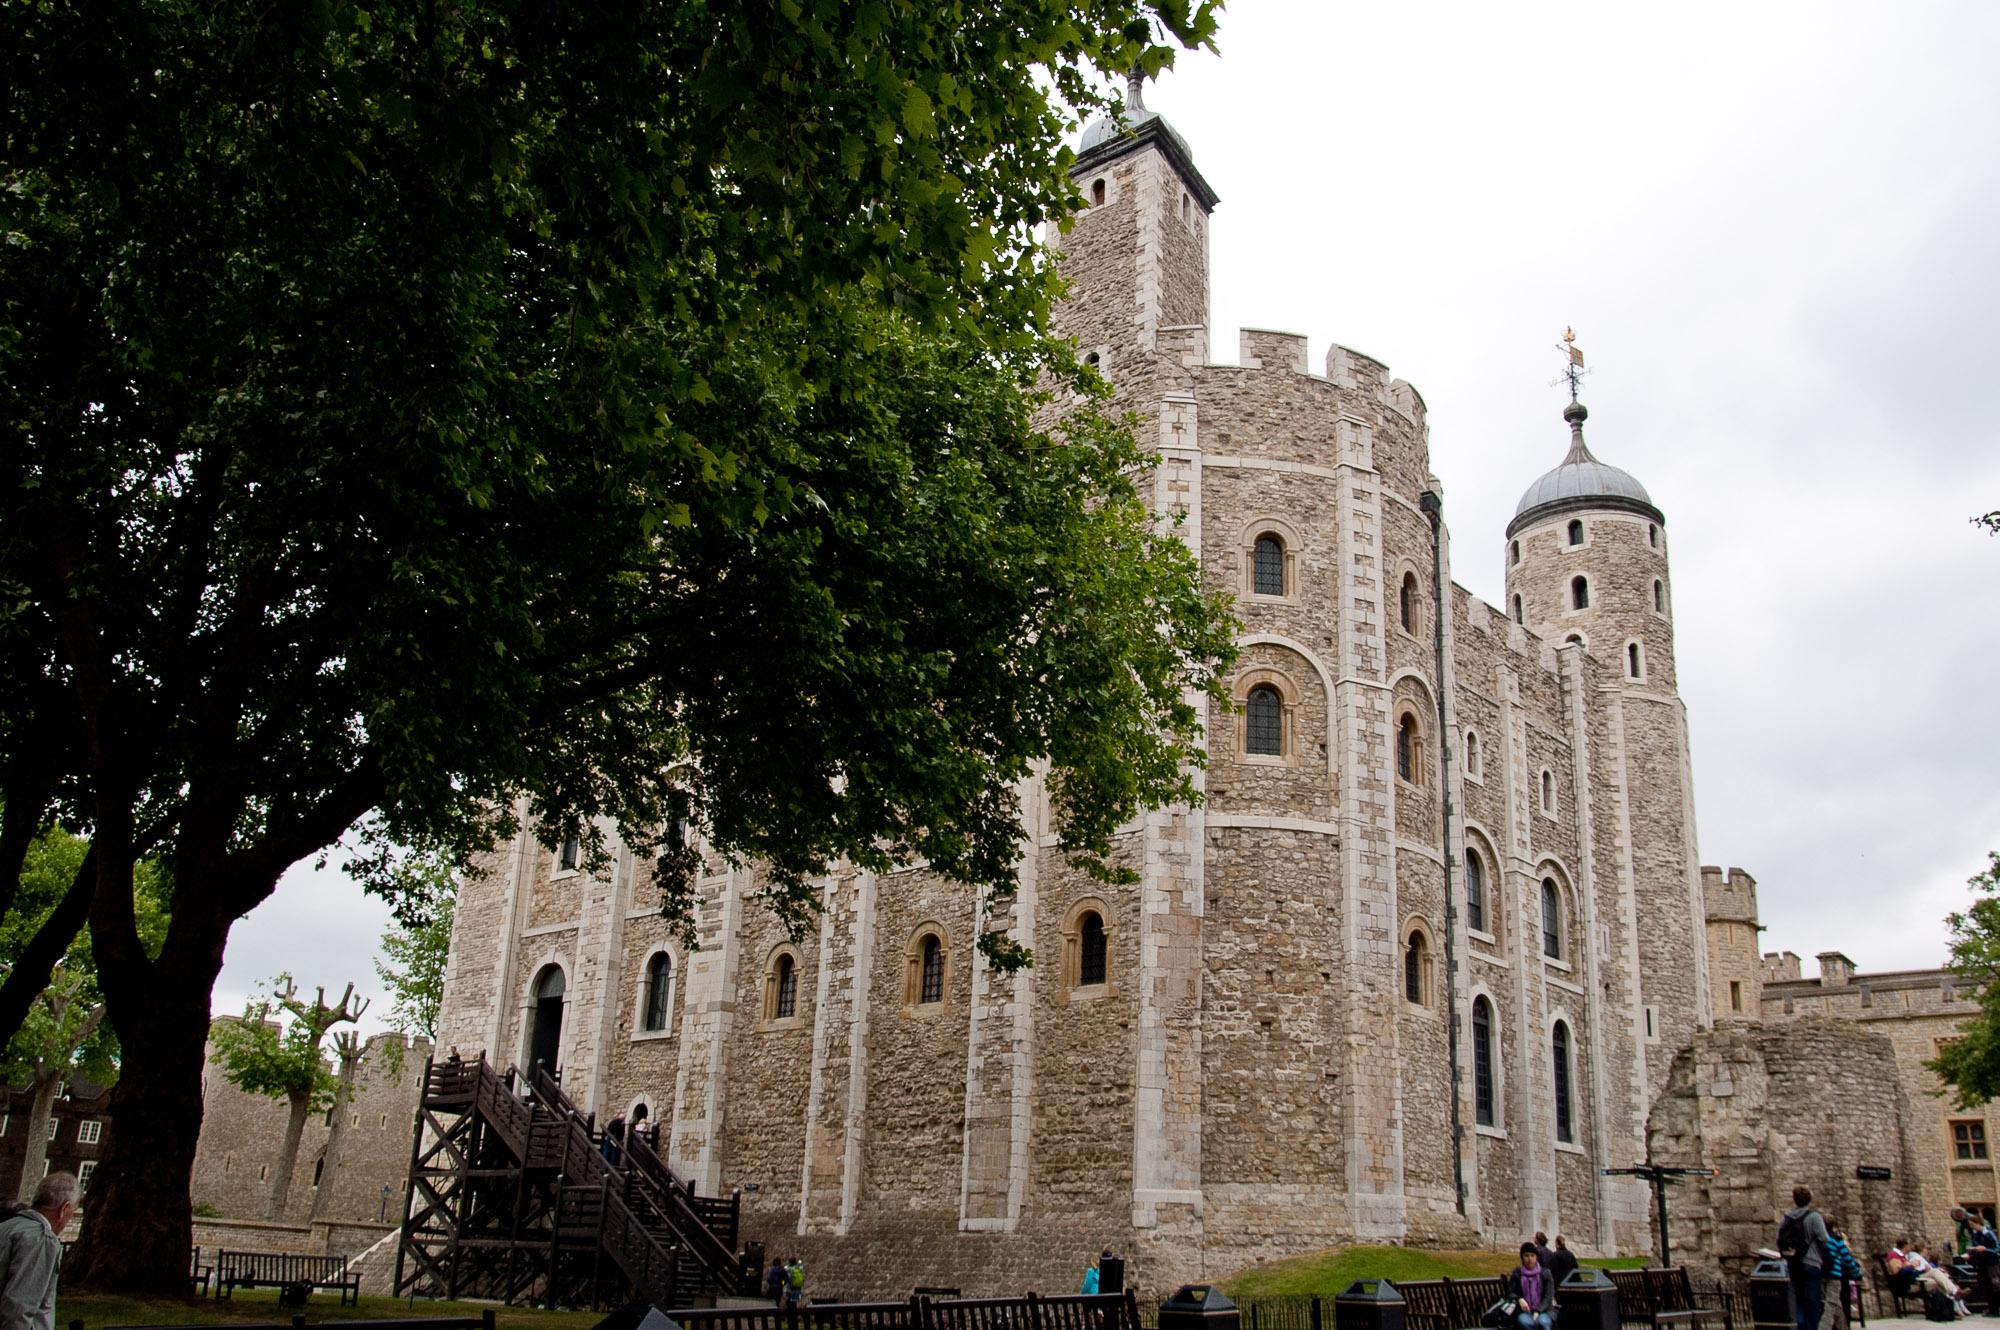 Tower VII